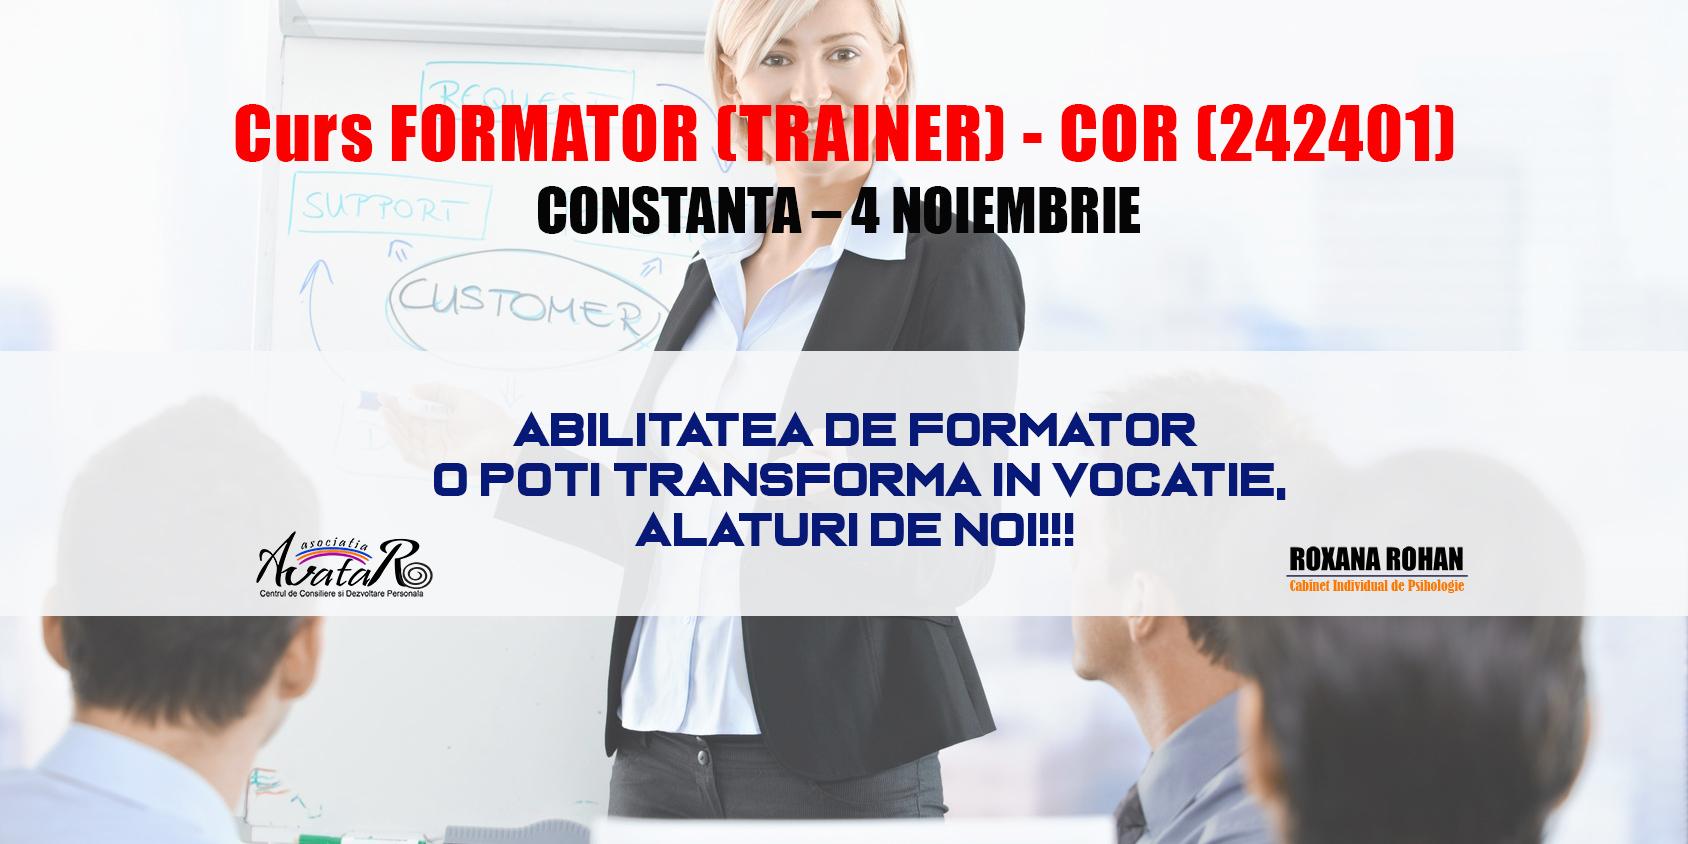 Curs Formator Trainer – COR 242401 Constanta – 4 Noiembrie!